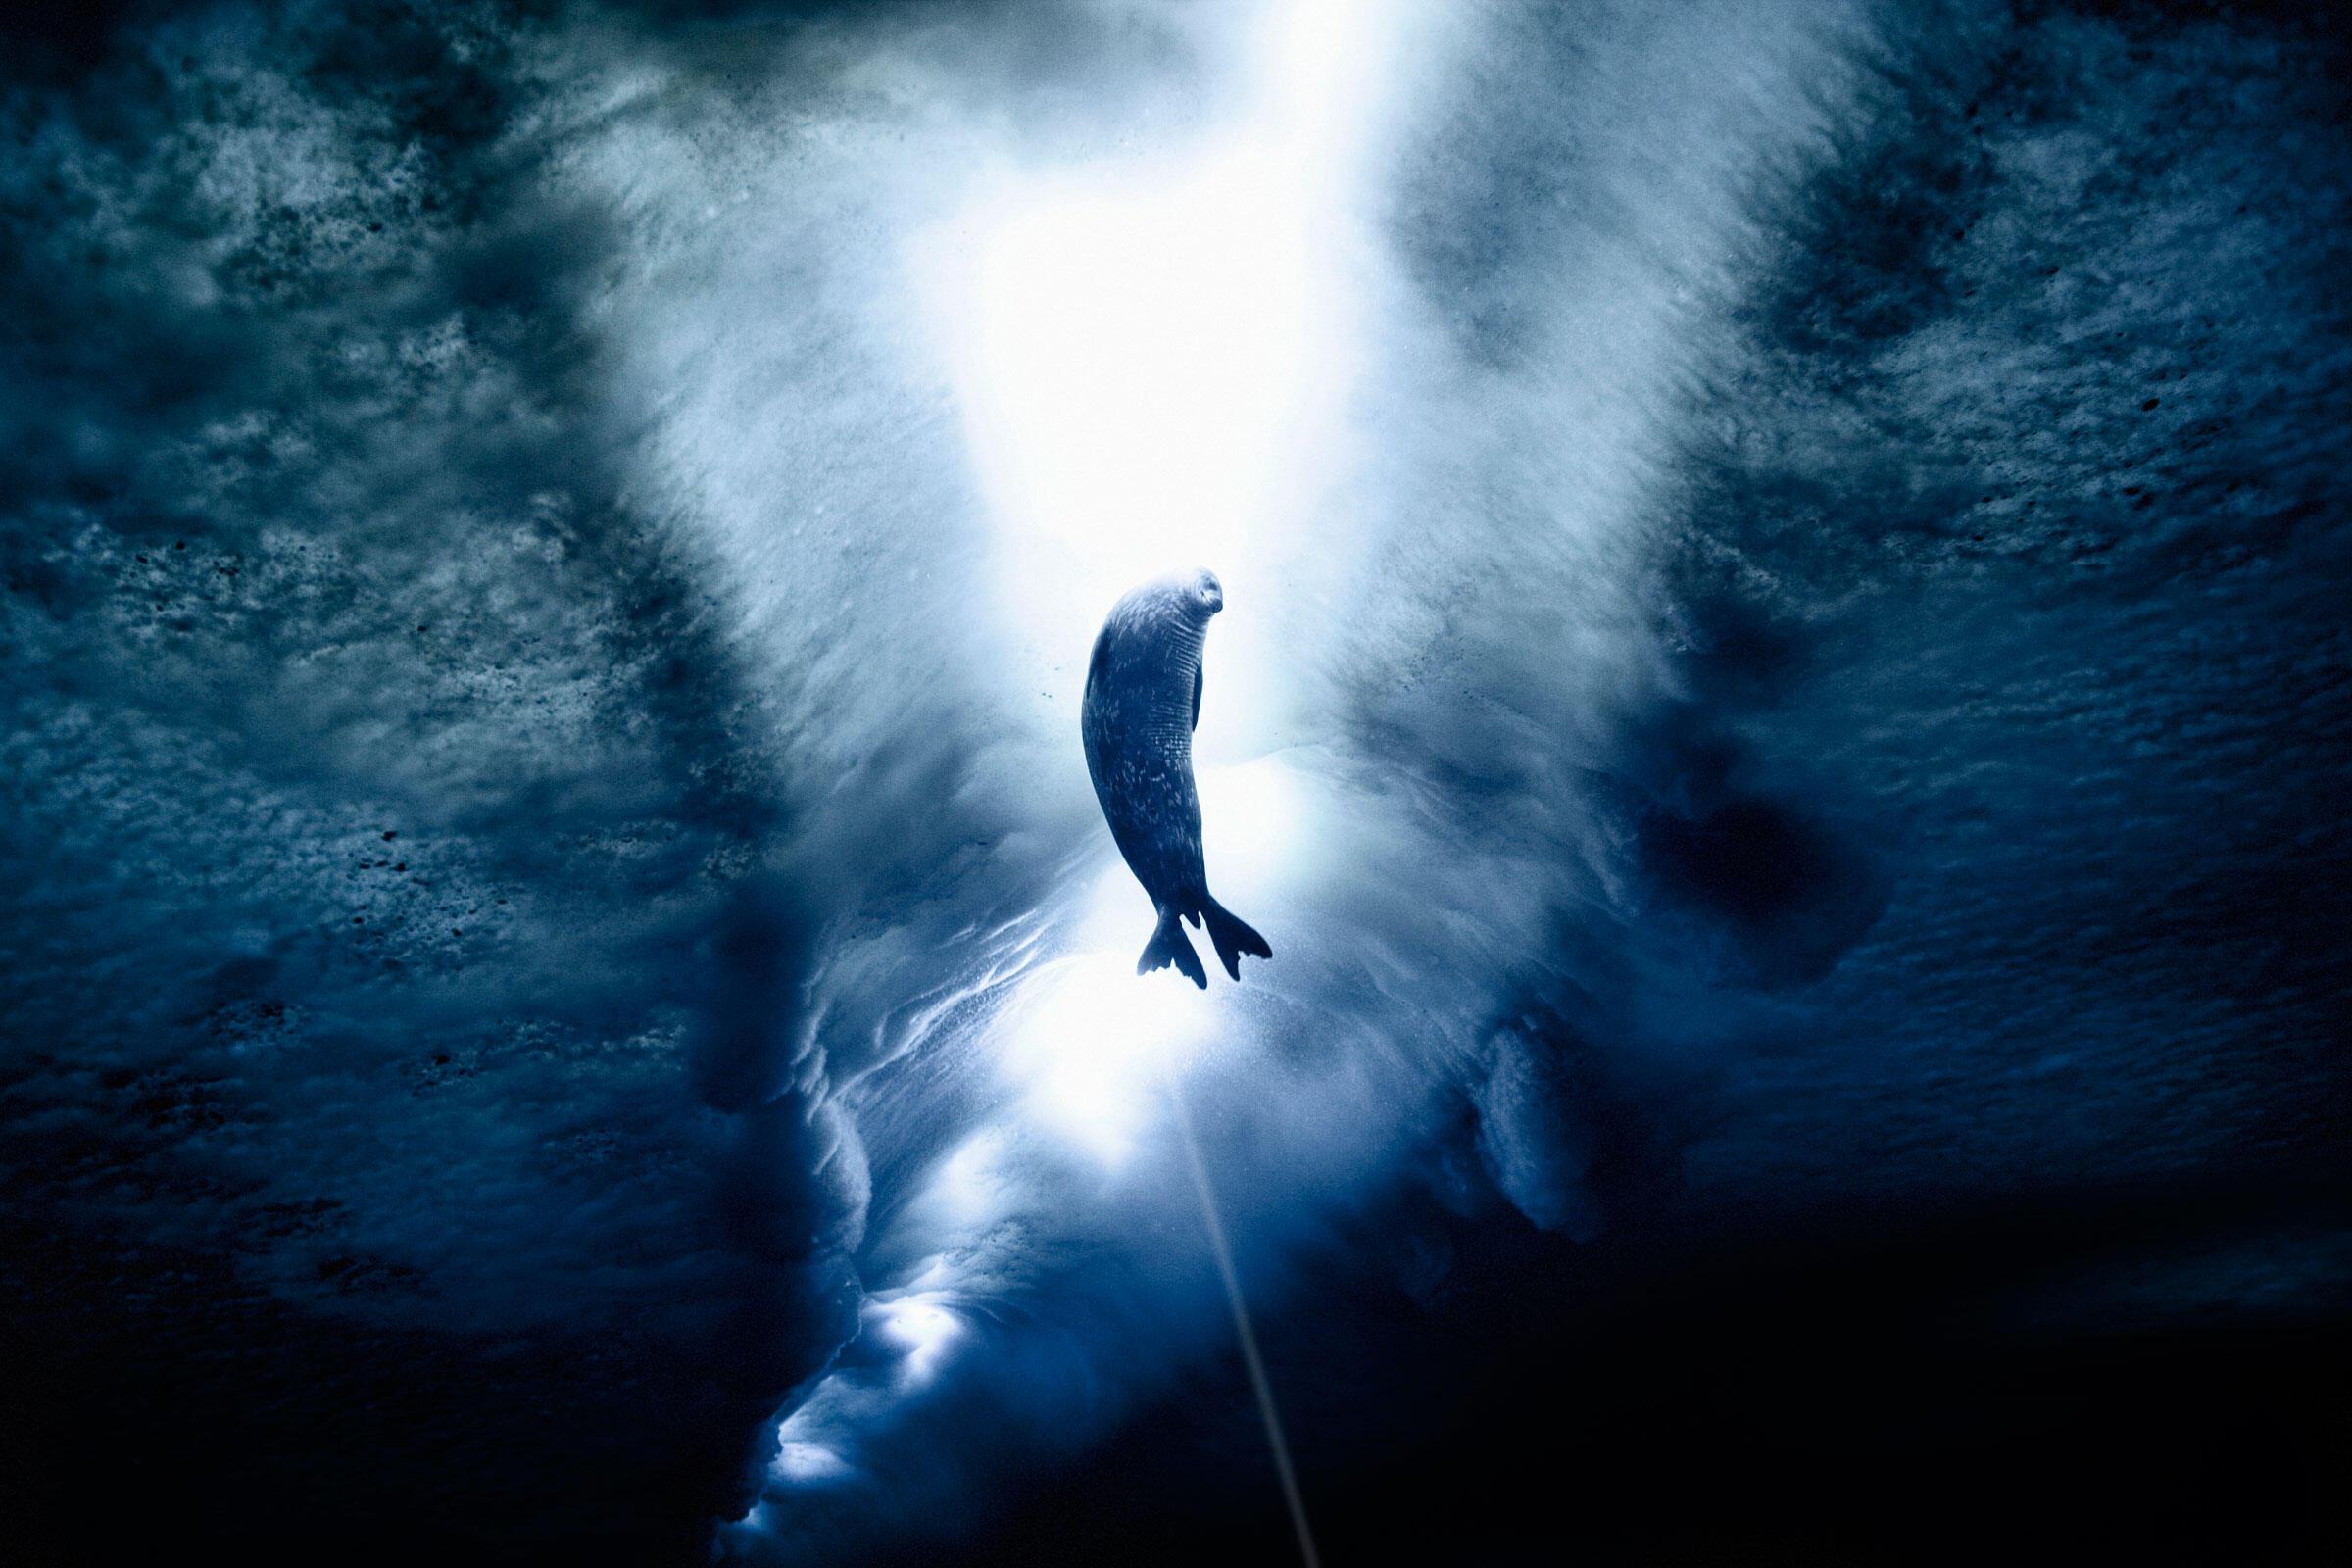 Weddell seal under the ice. Ross Sea, Antarctica. John Weller